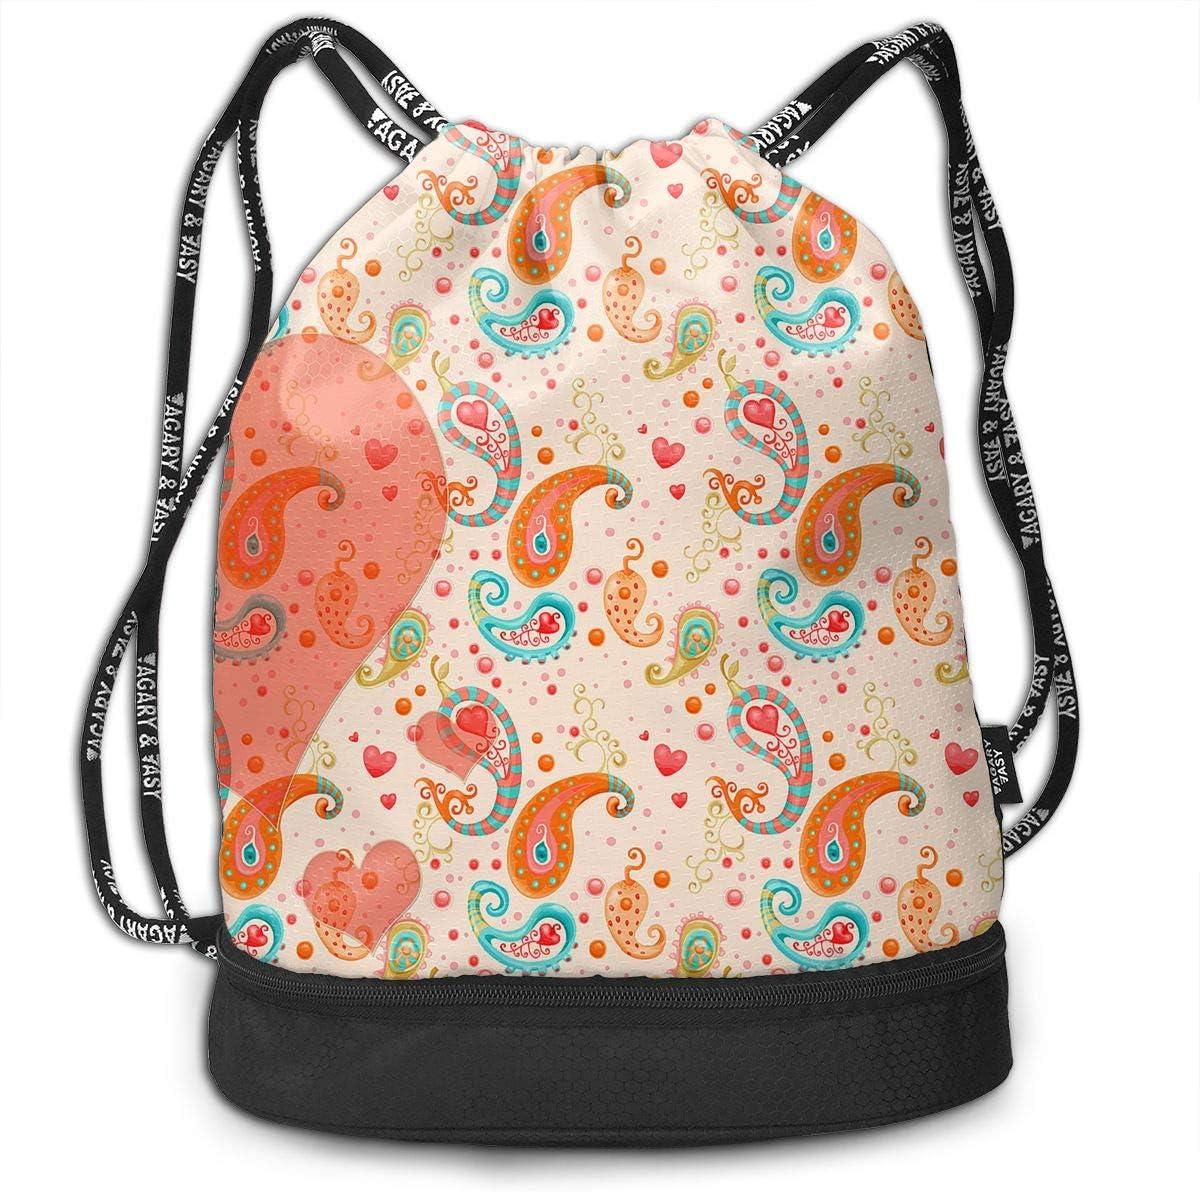 Love Cinch Backpack Sackpack Tote Sack Zol1Q Lightweight Waterproof Large Storage Drawstring Bag for Men /& Women